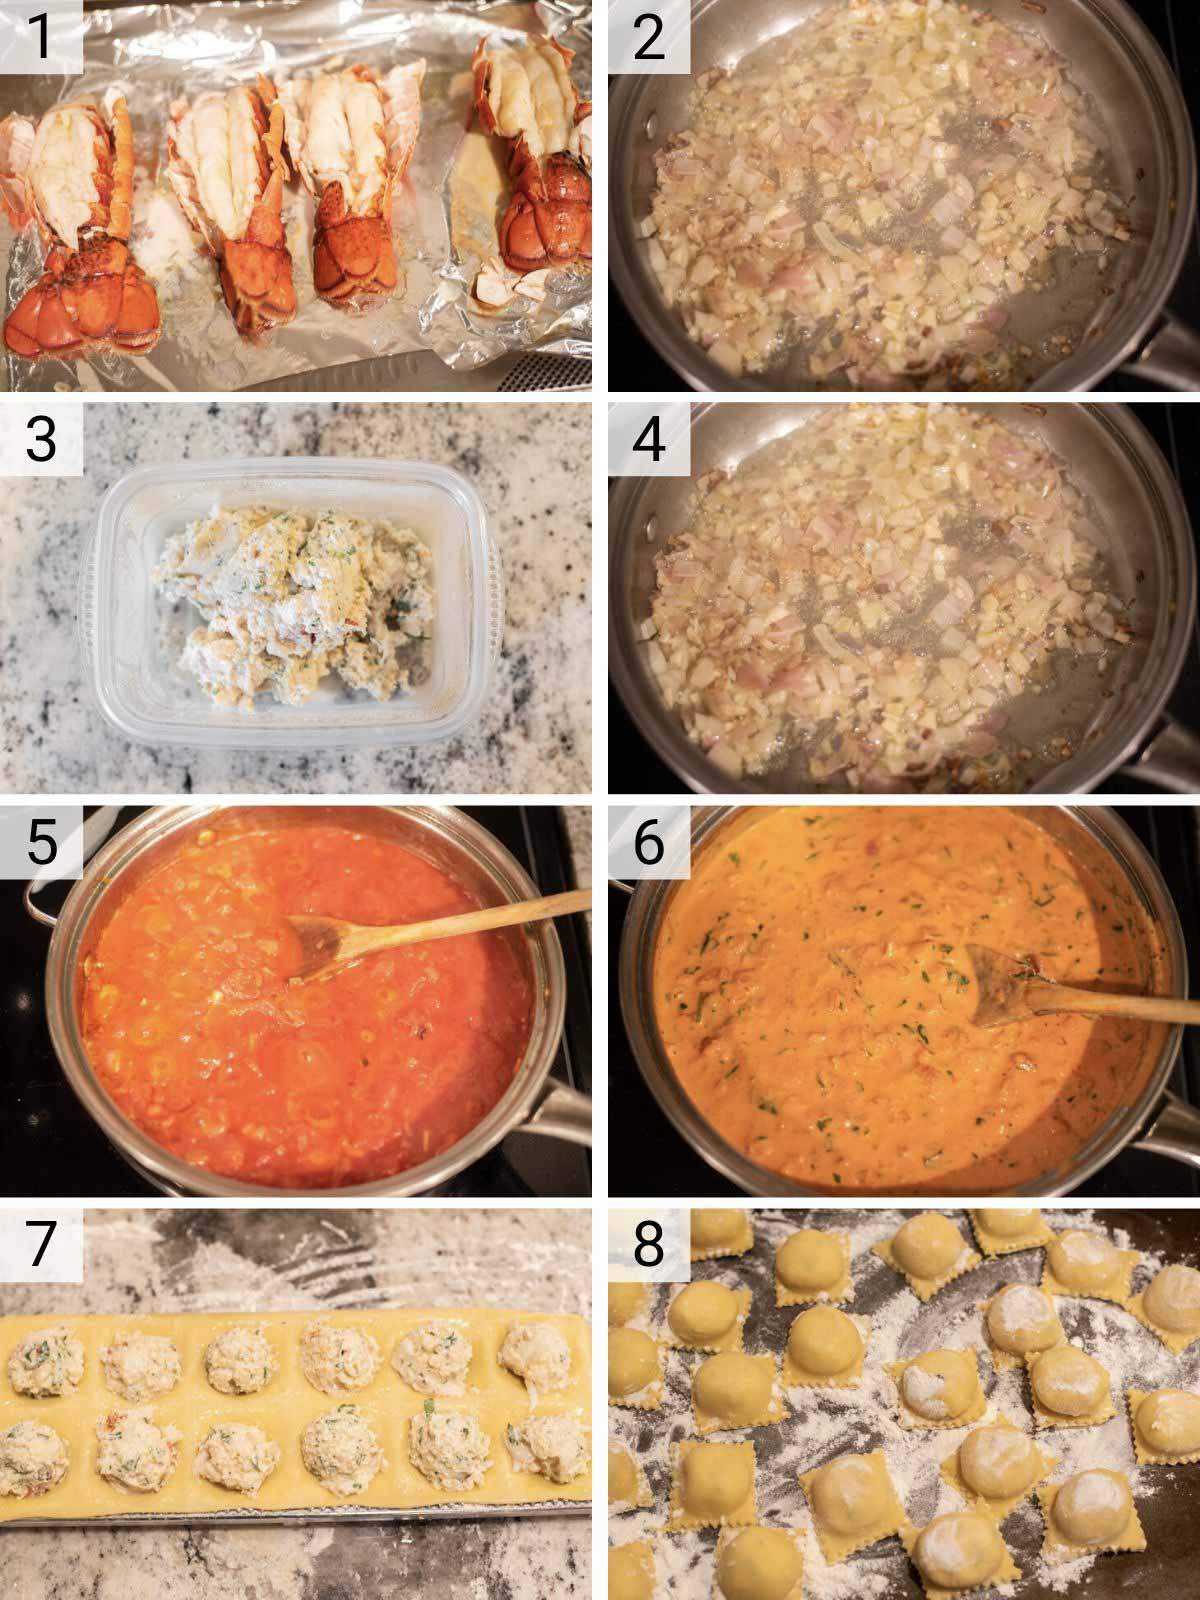 process shots of how to make lobster ravioli